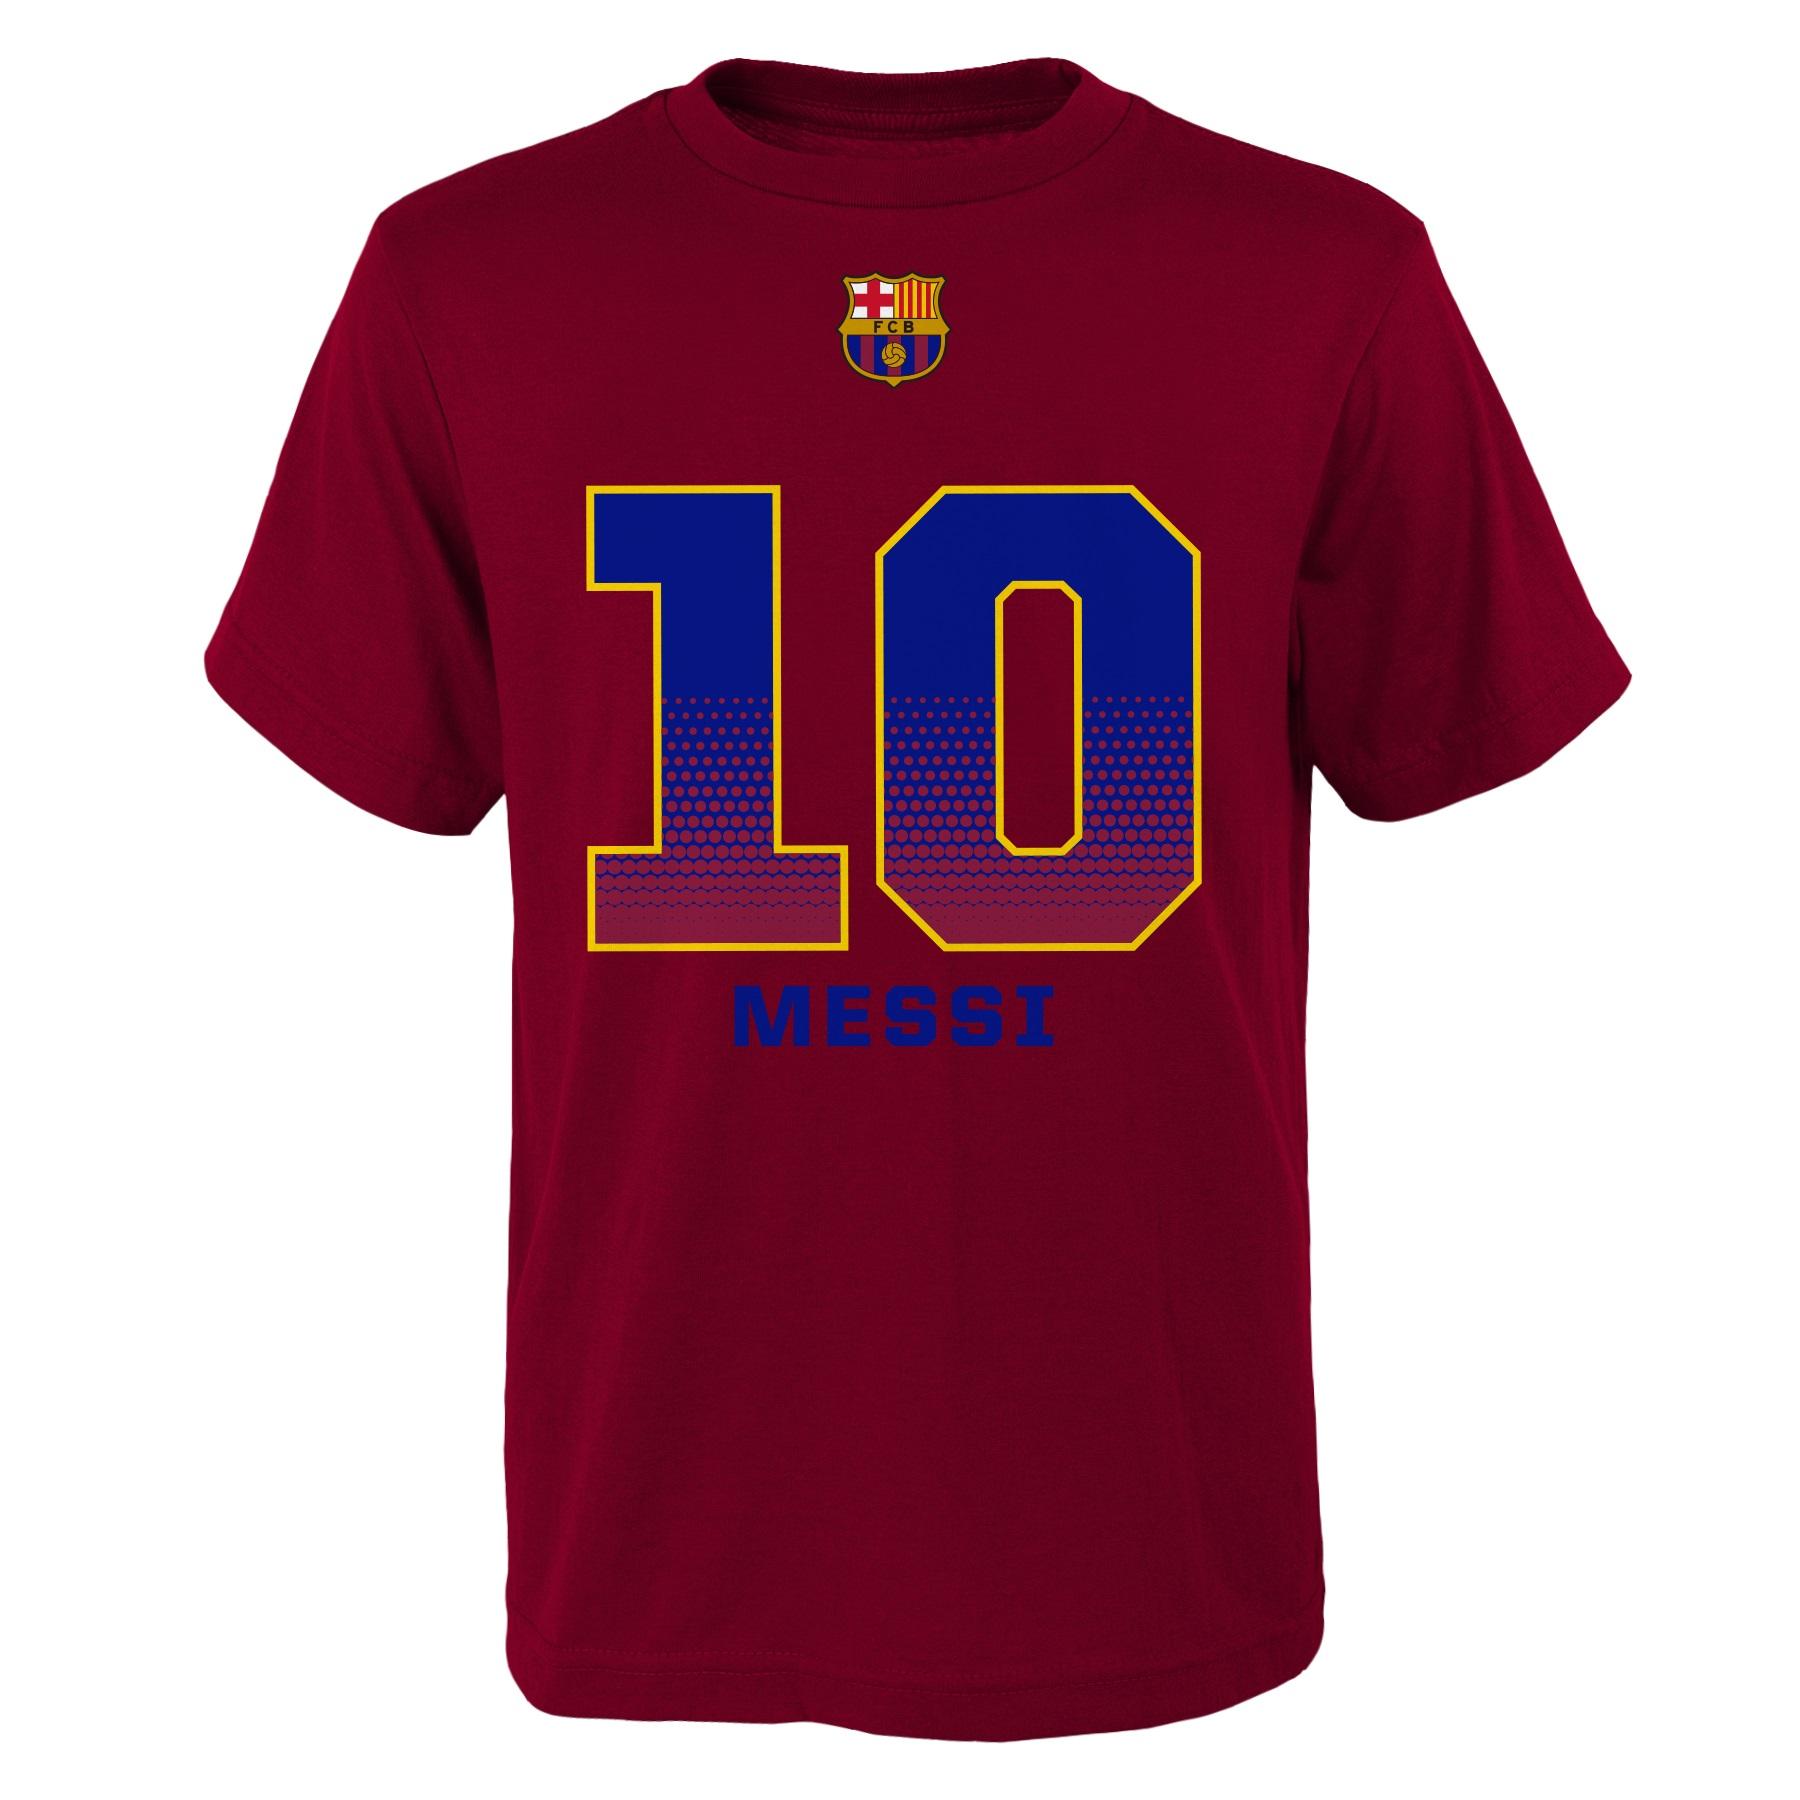 FC Barcelona Messi Youth Tee